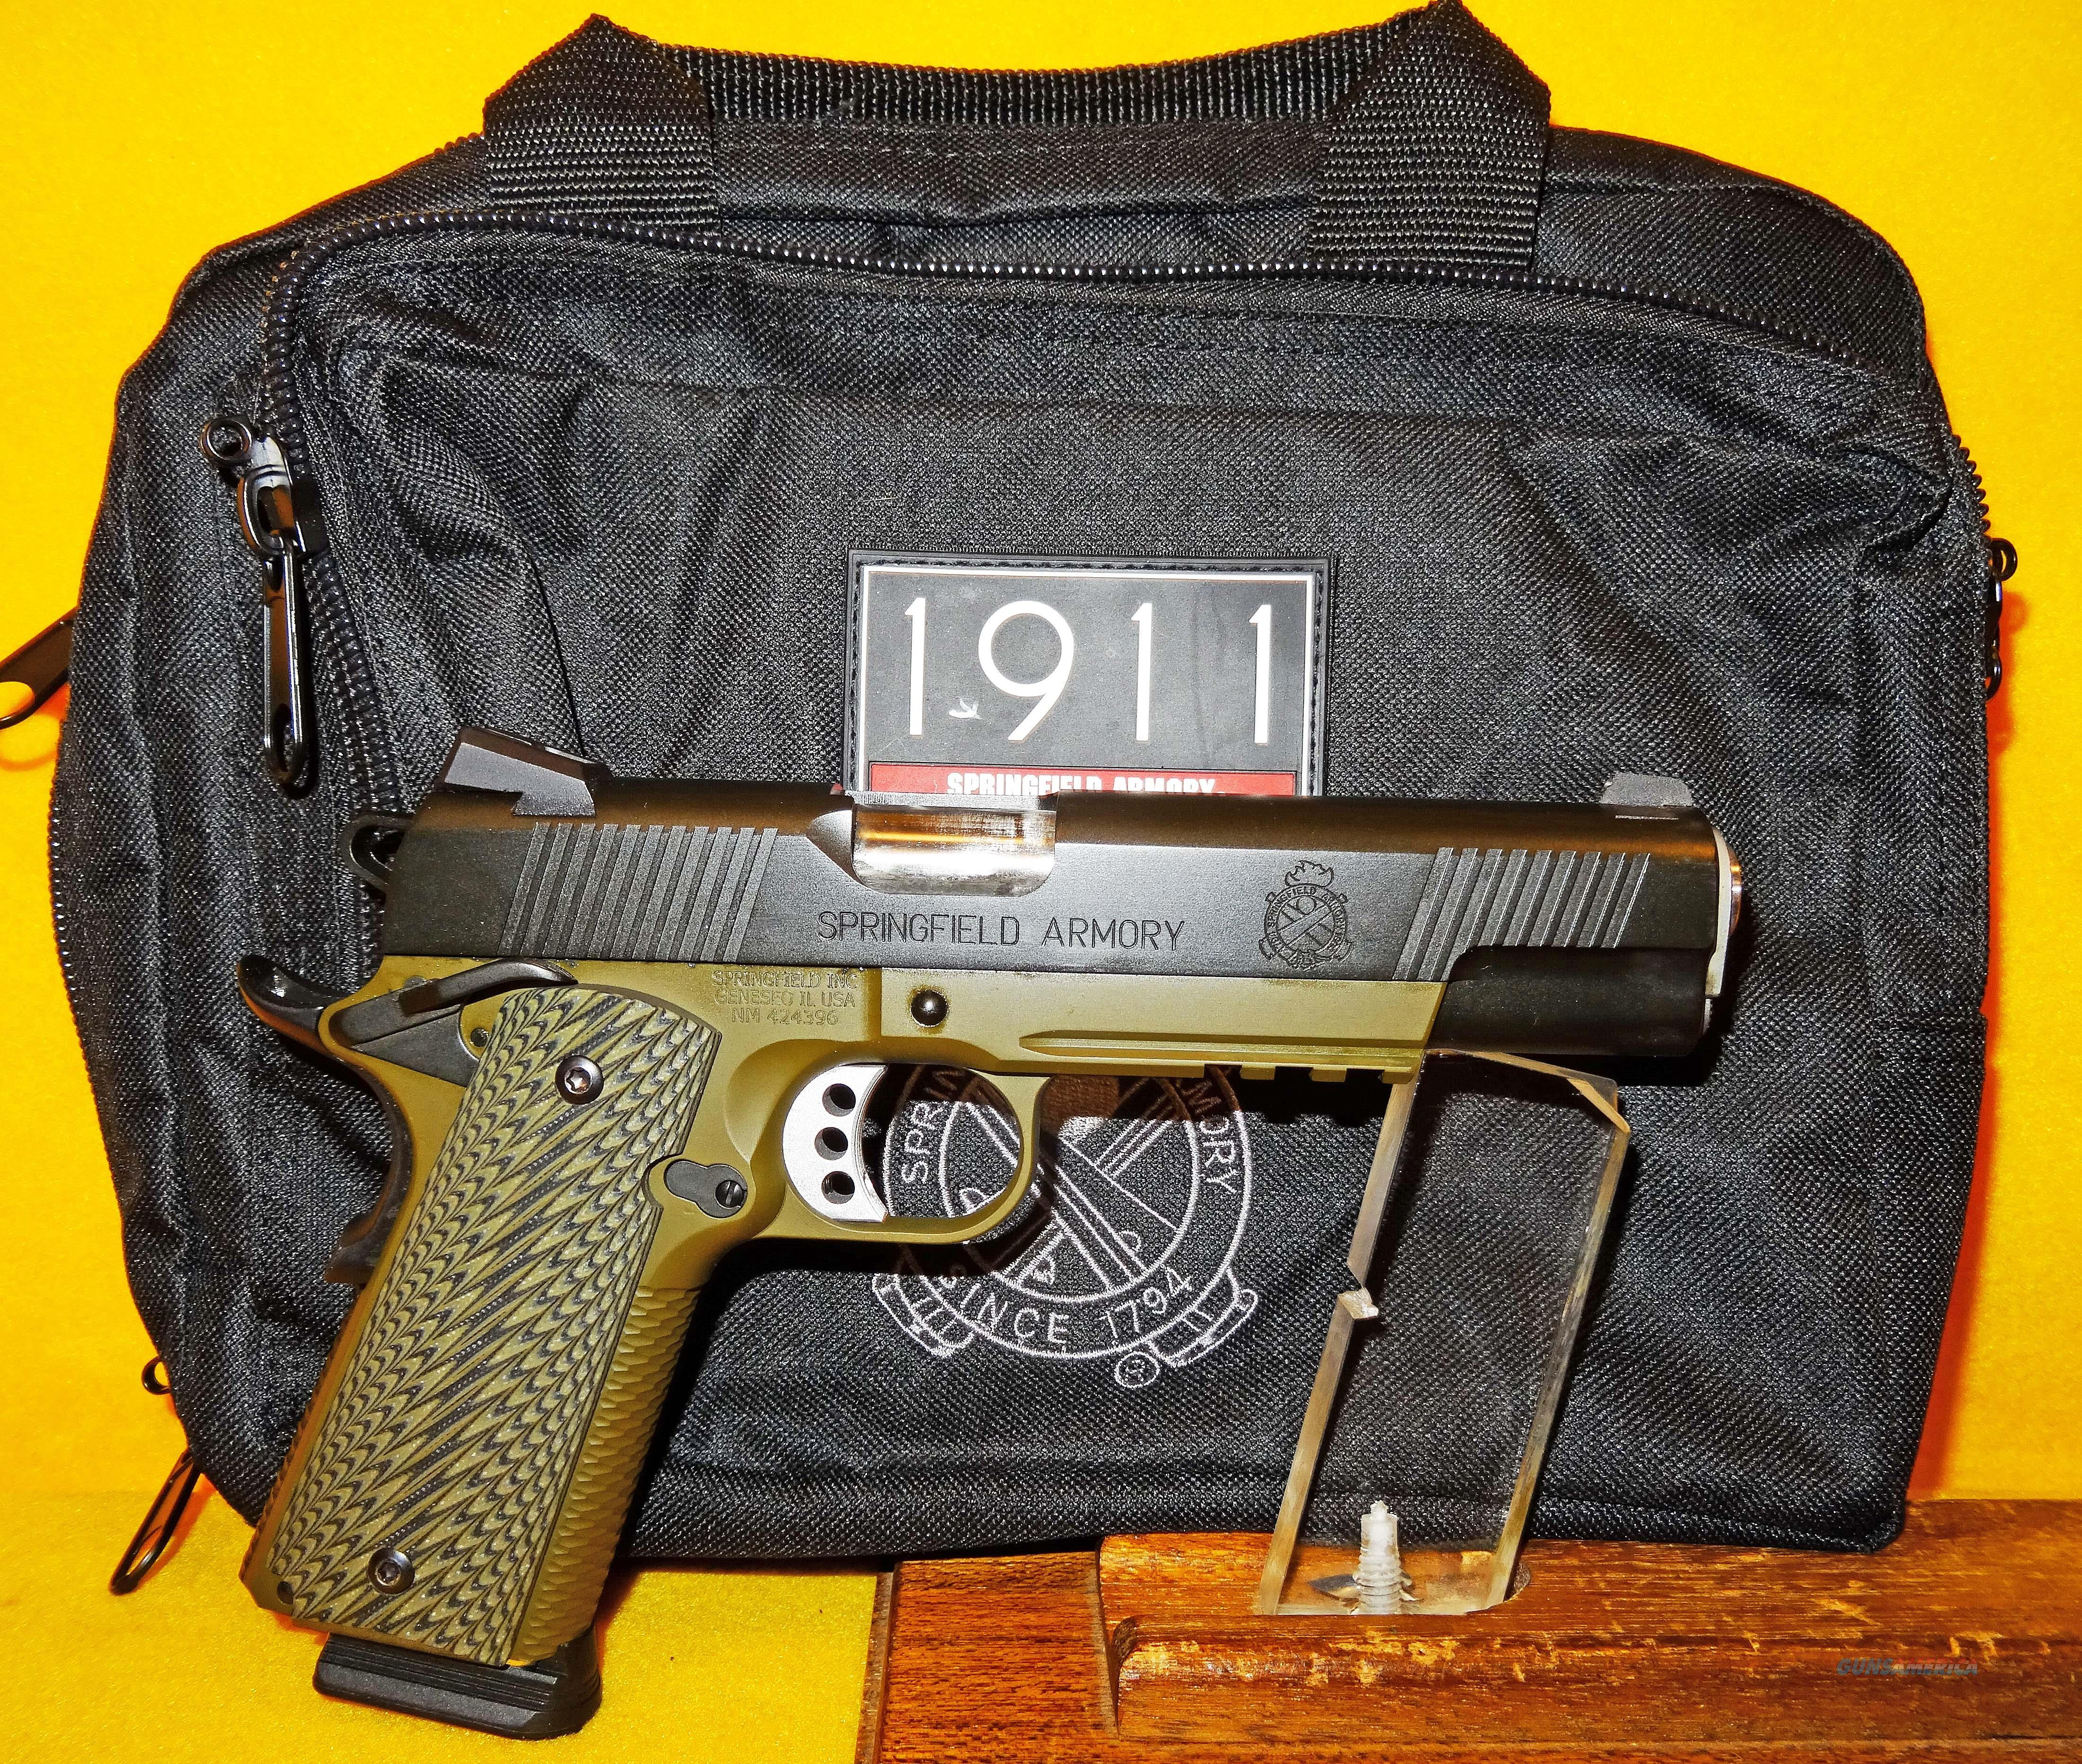 SPRINGFIELD ARMORY 1911 LOADED OPERATOR  Guns > Pistols > Springfield Armory Pistols > 1911 Type